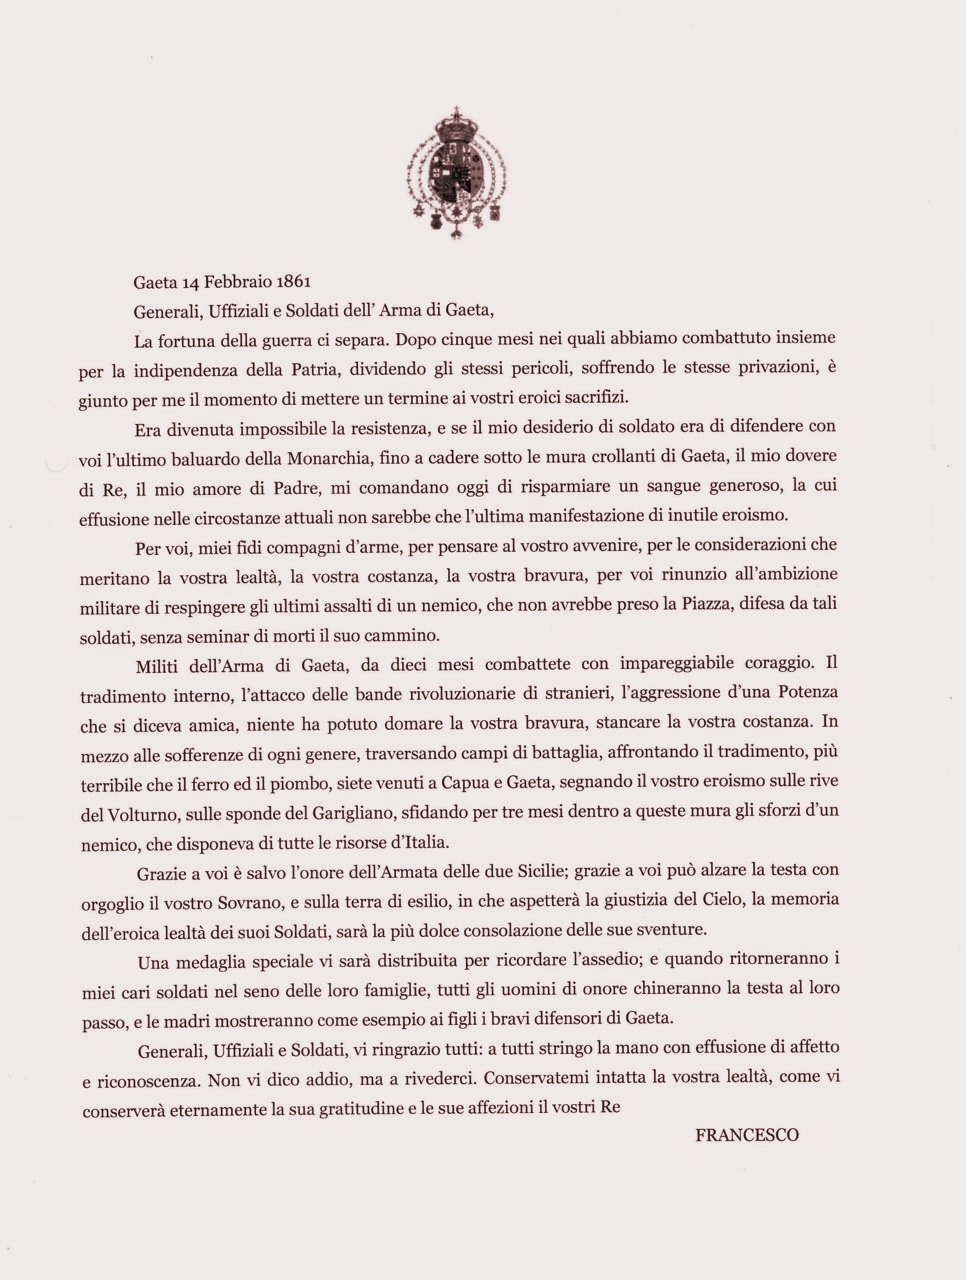 Francesco II Gaeta 14 febbraio 1861 Ordine